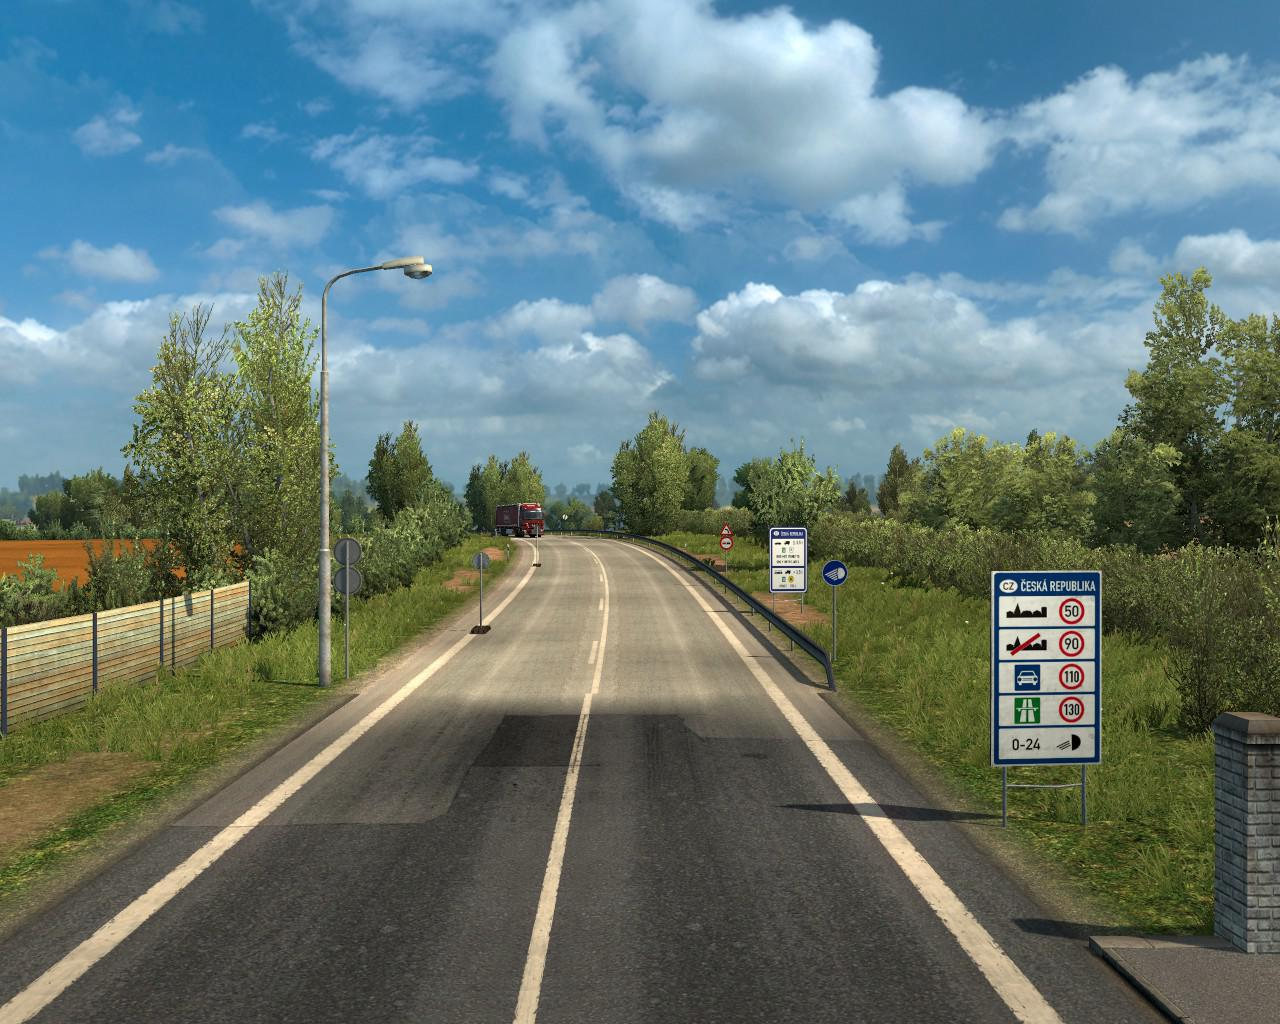 [Obrazek: border-improvements-pnqjru.jpg]